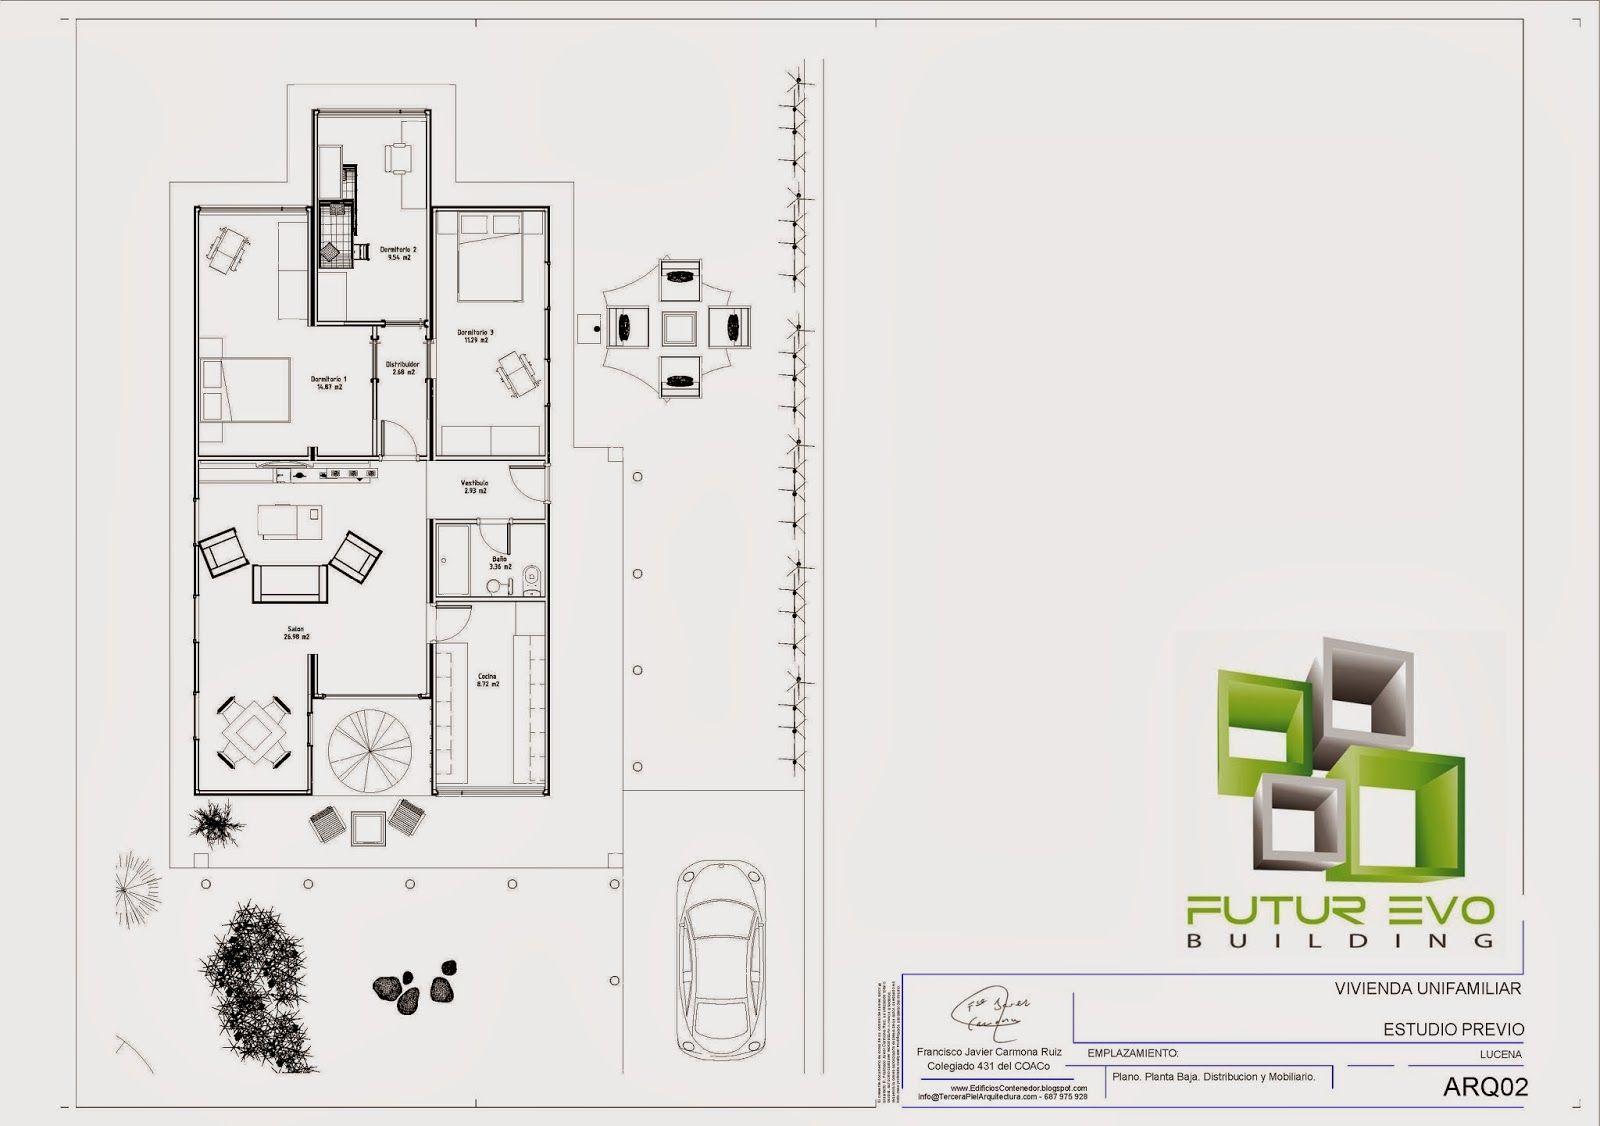 contenedore medidas - Buscar con Google | Planos Casas Contenedores ...